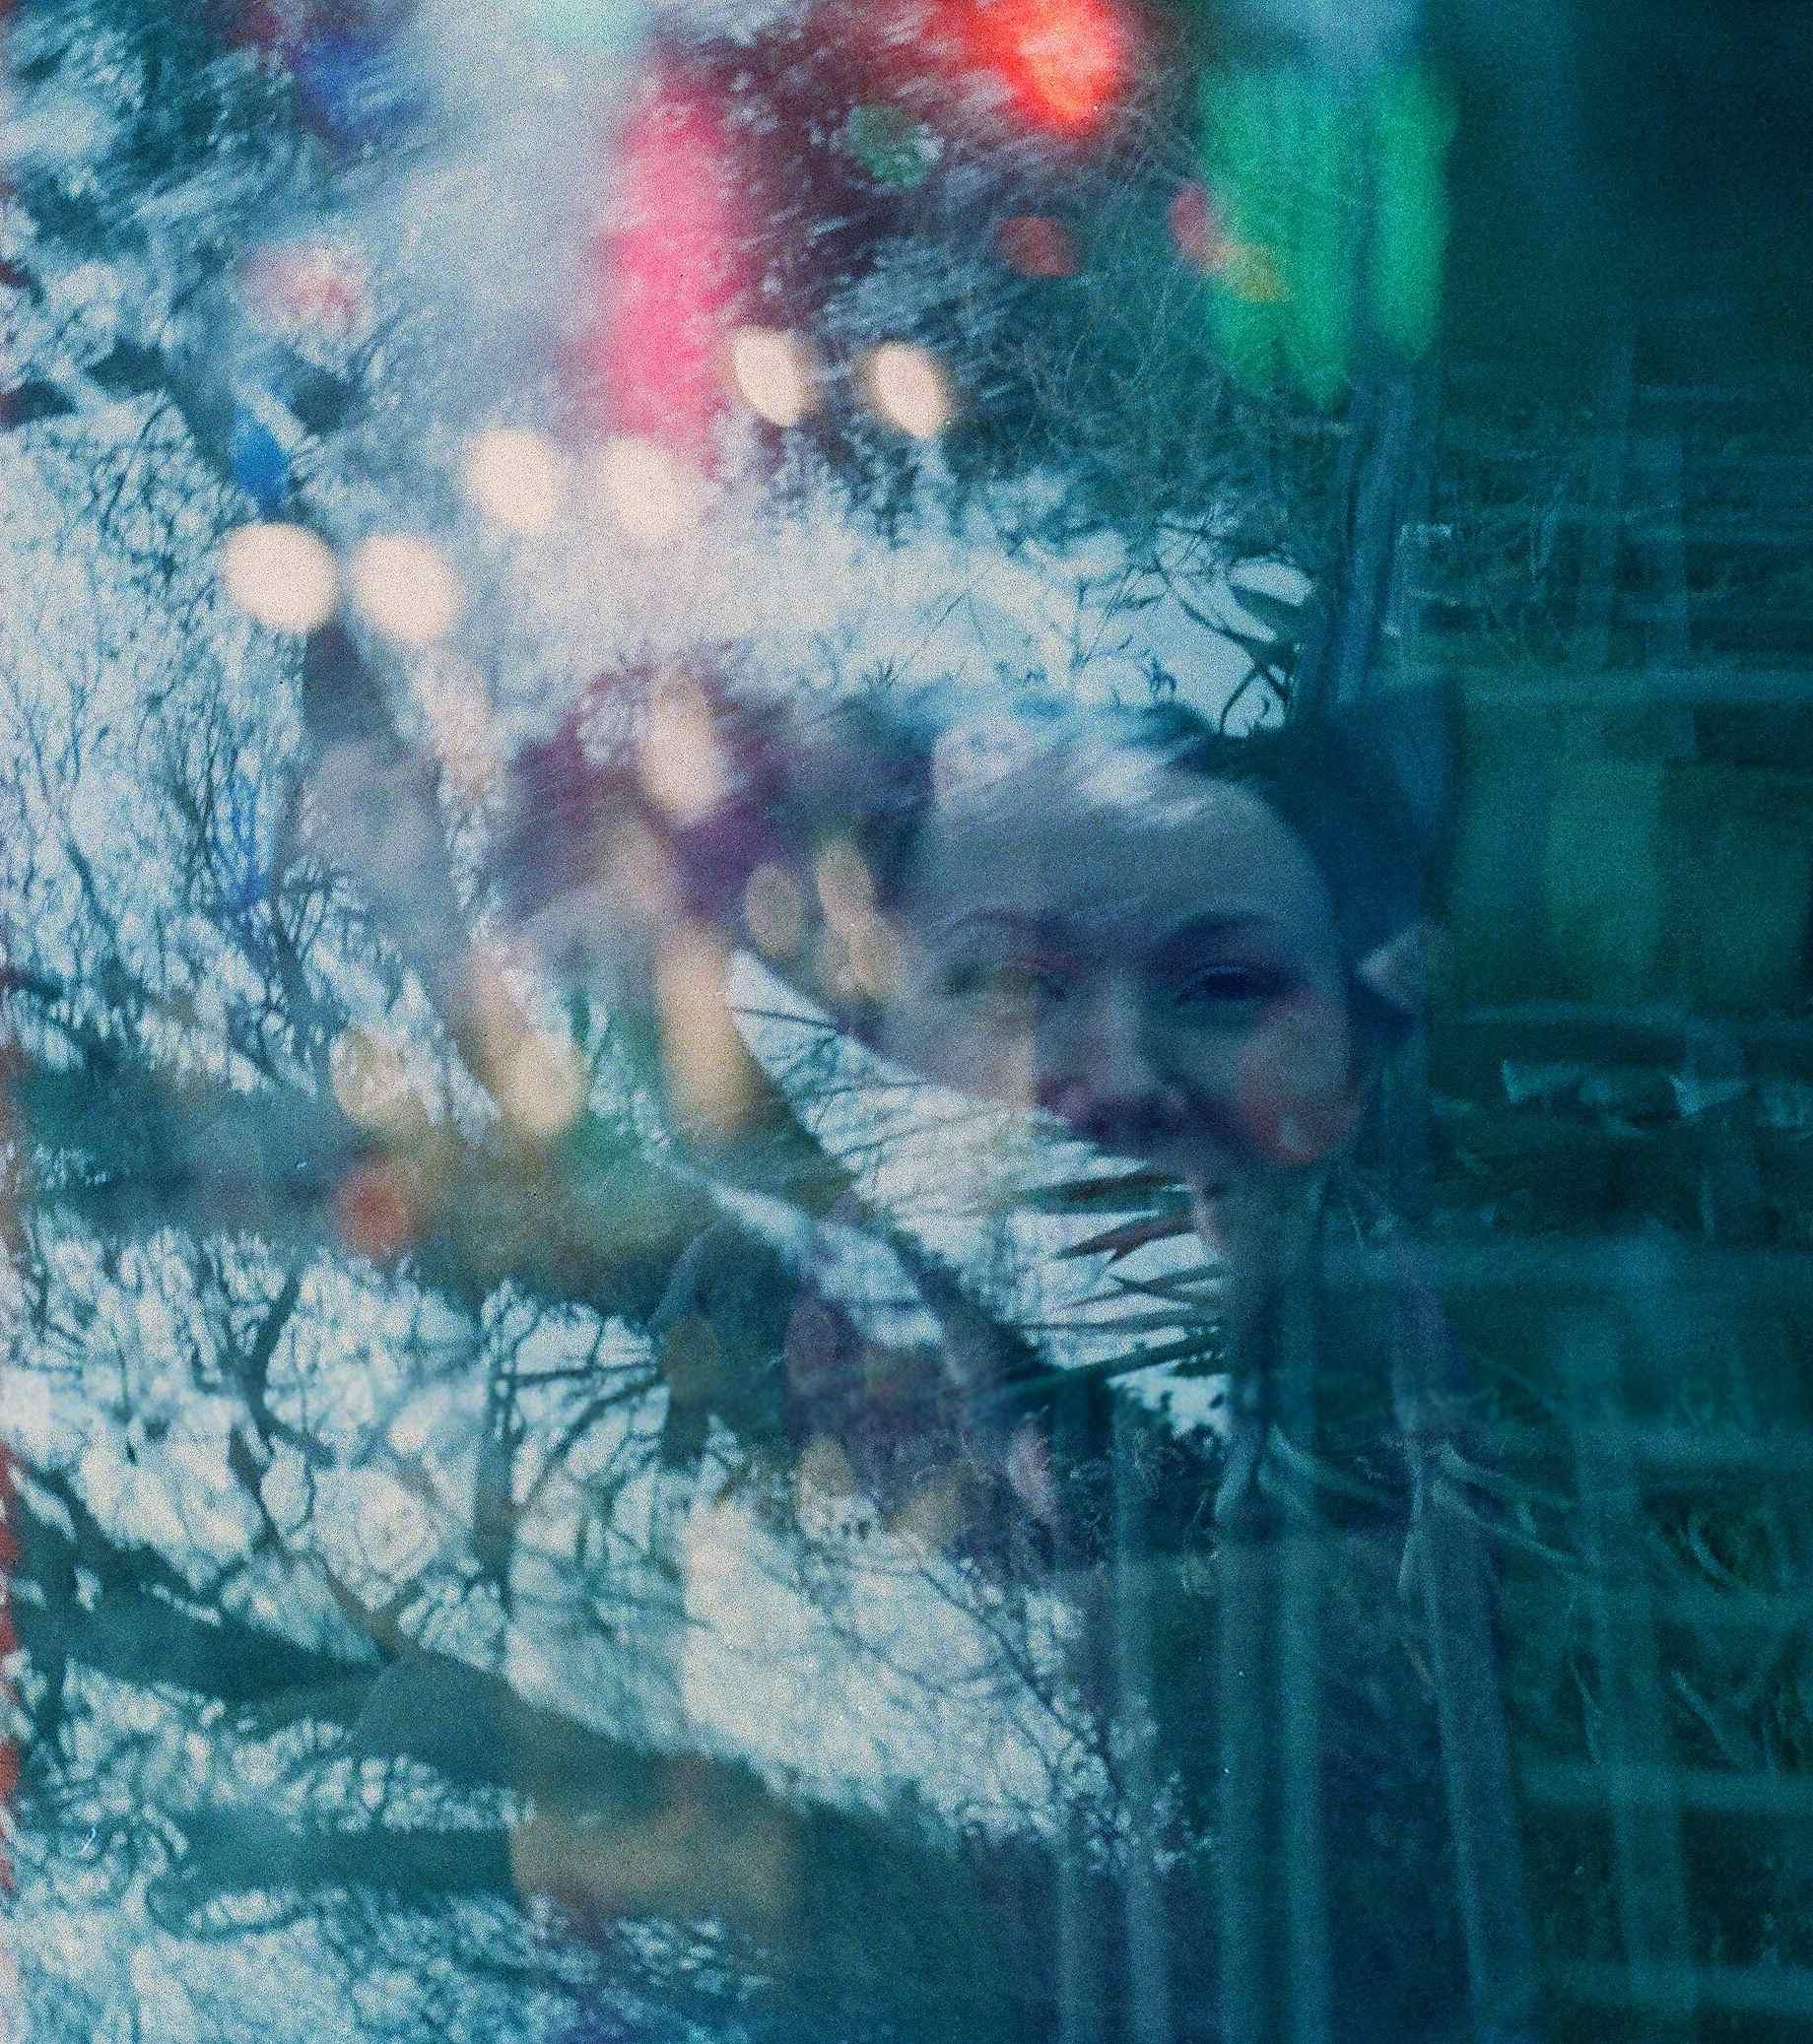 """Justina"" by  Zivile Zablackaite (Credit: TAYO  Issue Three)"